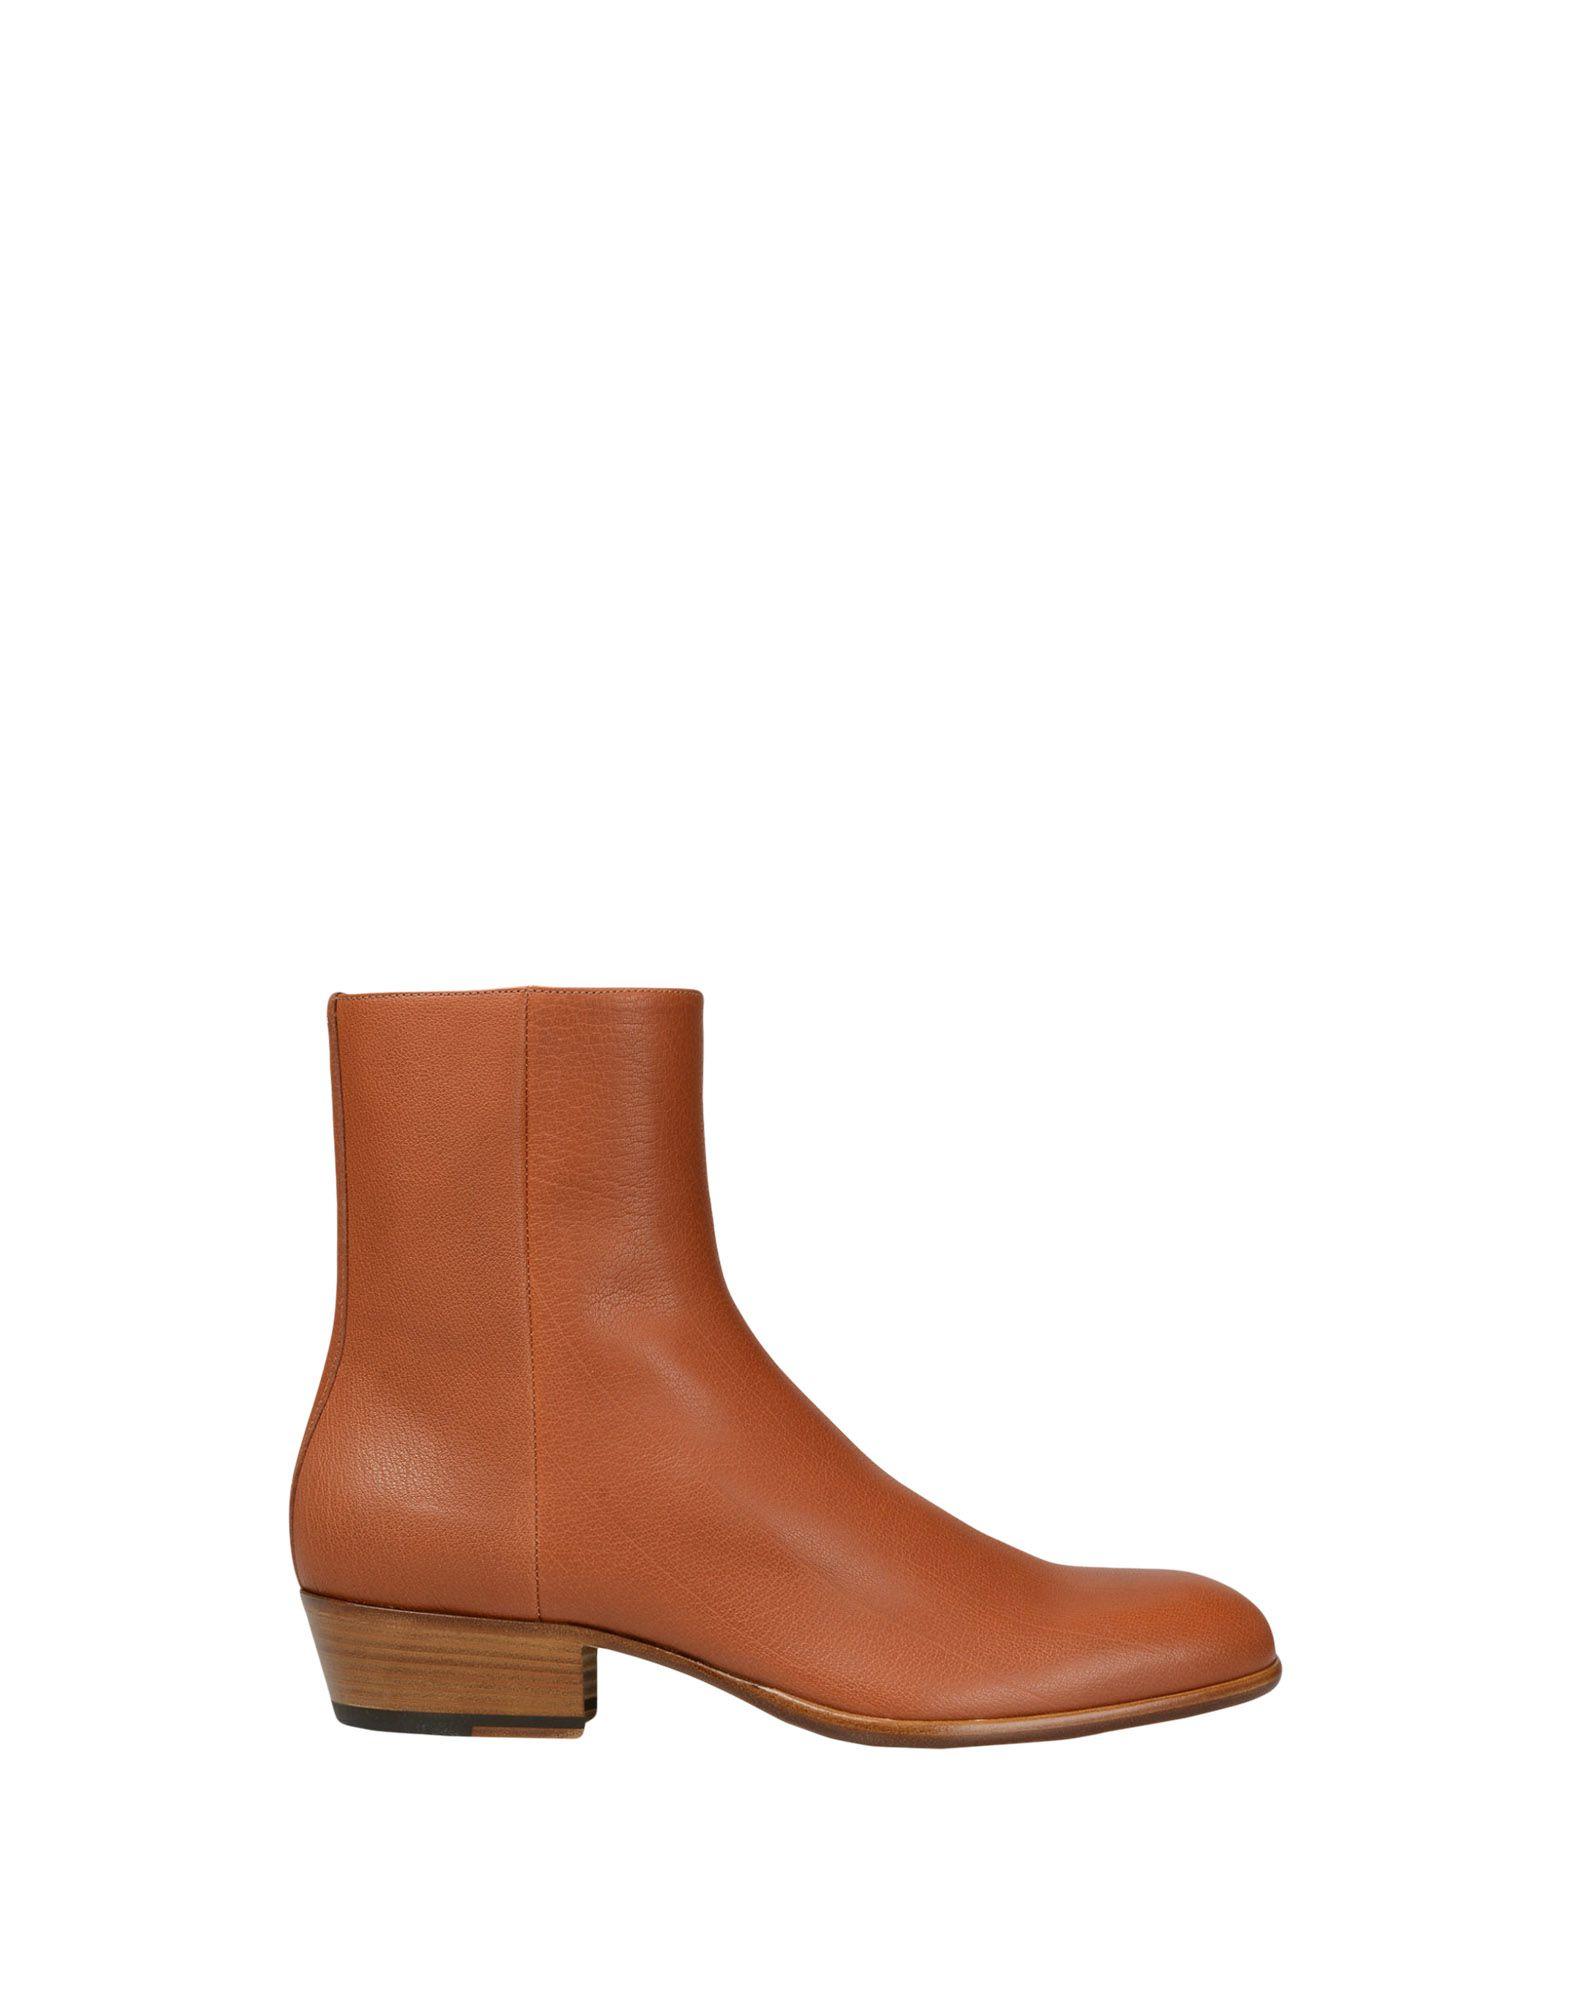 Maison Margiela Boots Boots Boots - Men Maison Margiela Boots online on  United Kingdom - 11353569JF 789310